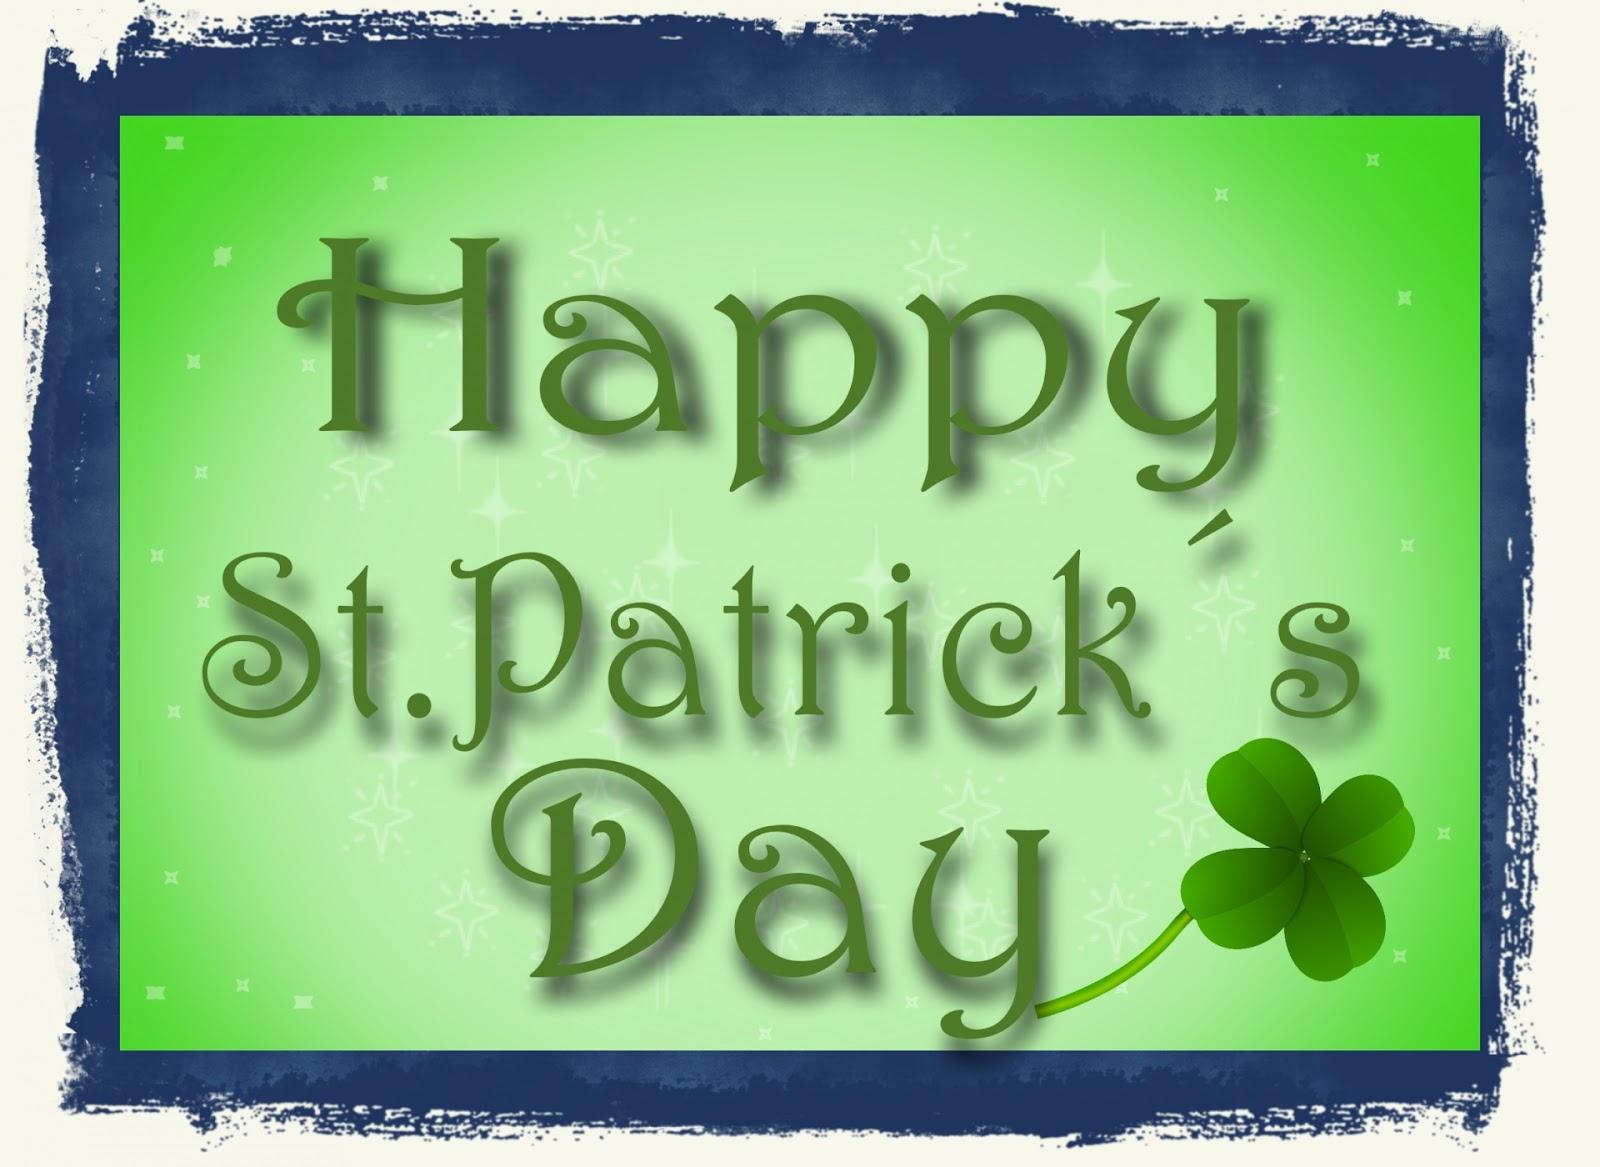 ... St. Patrick's Day ...